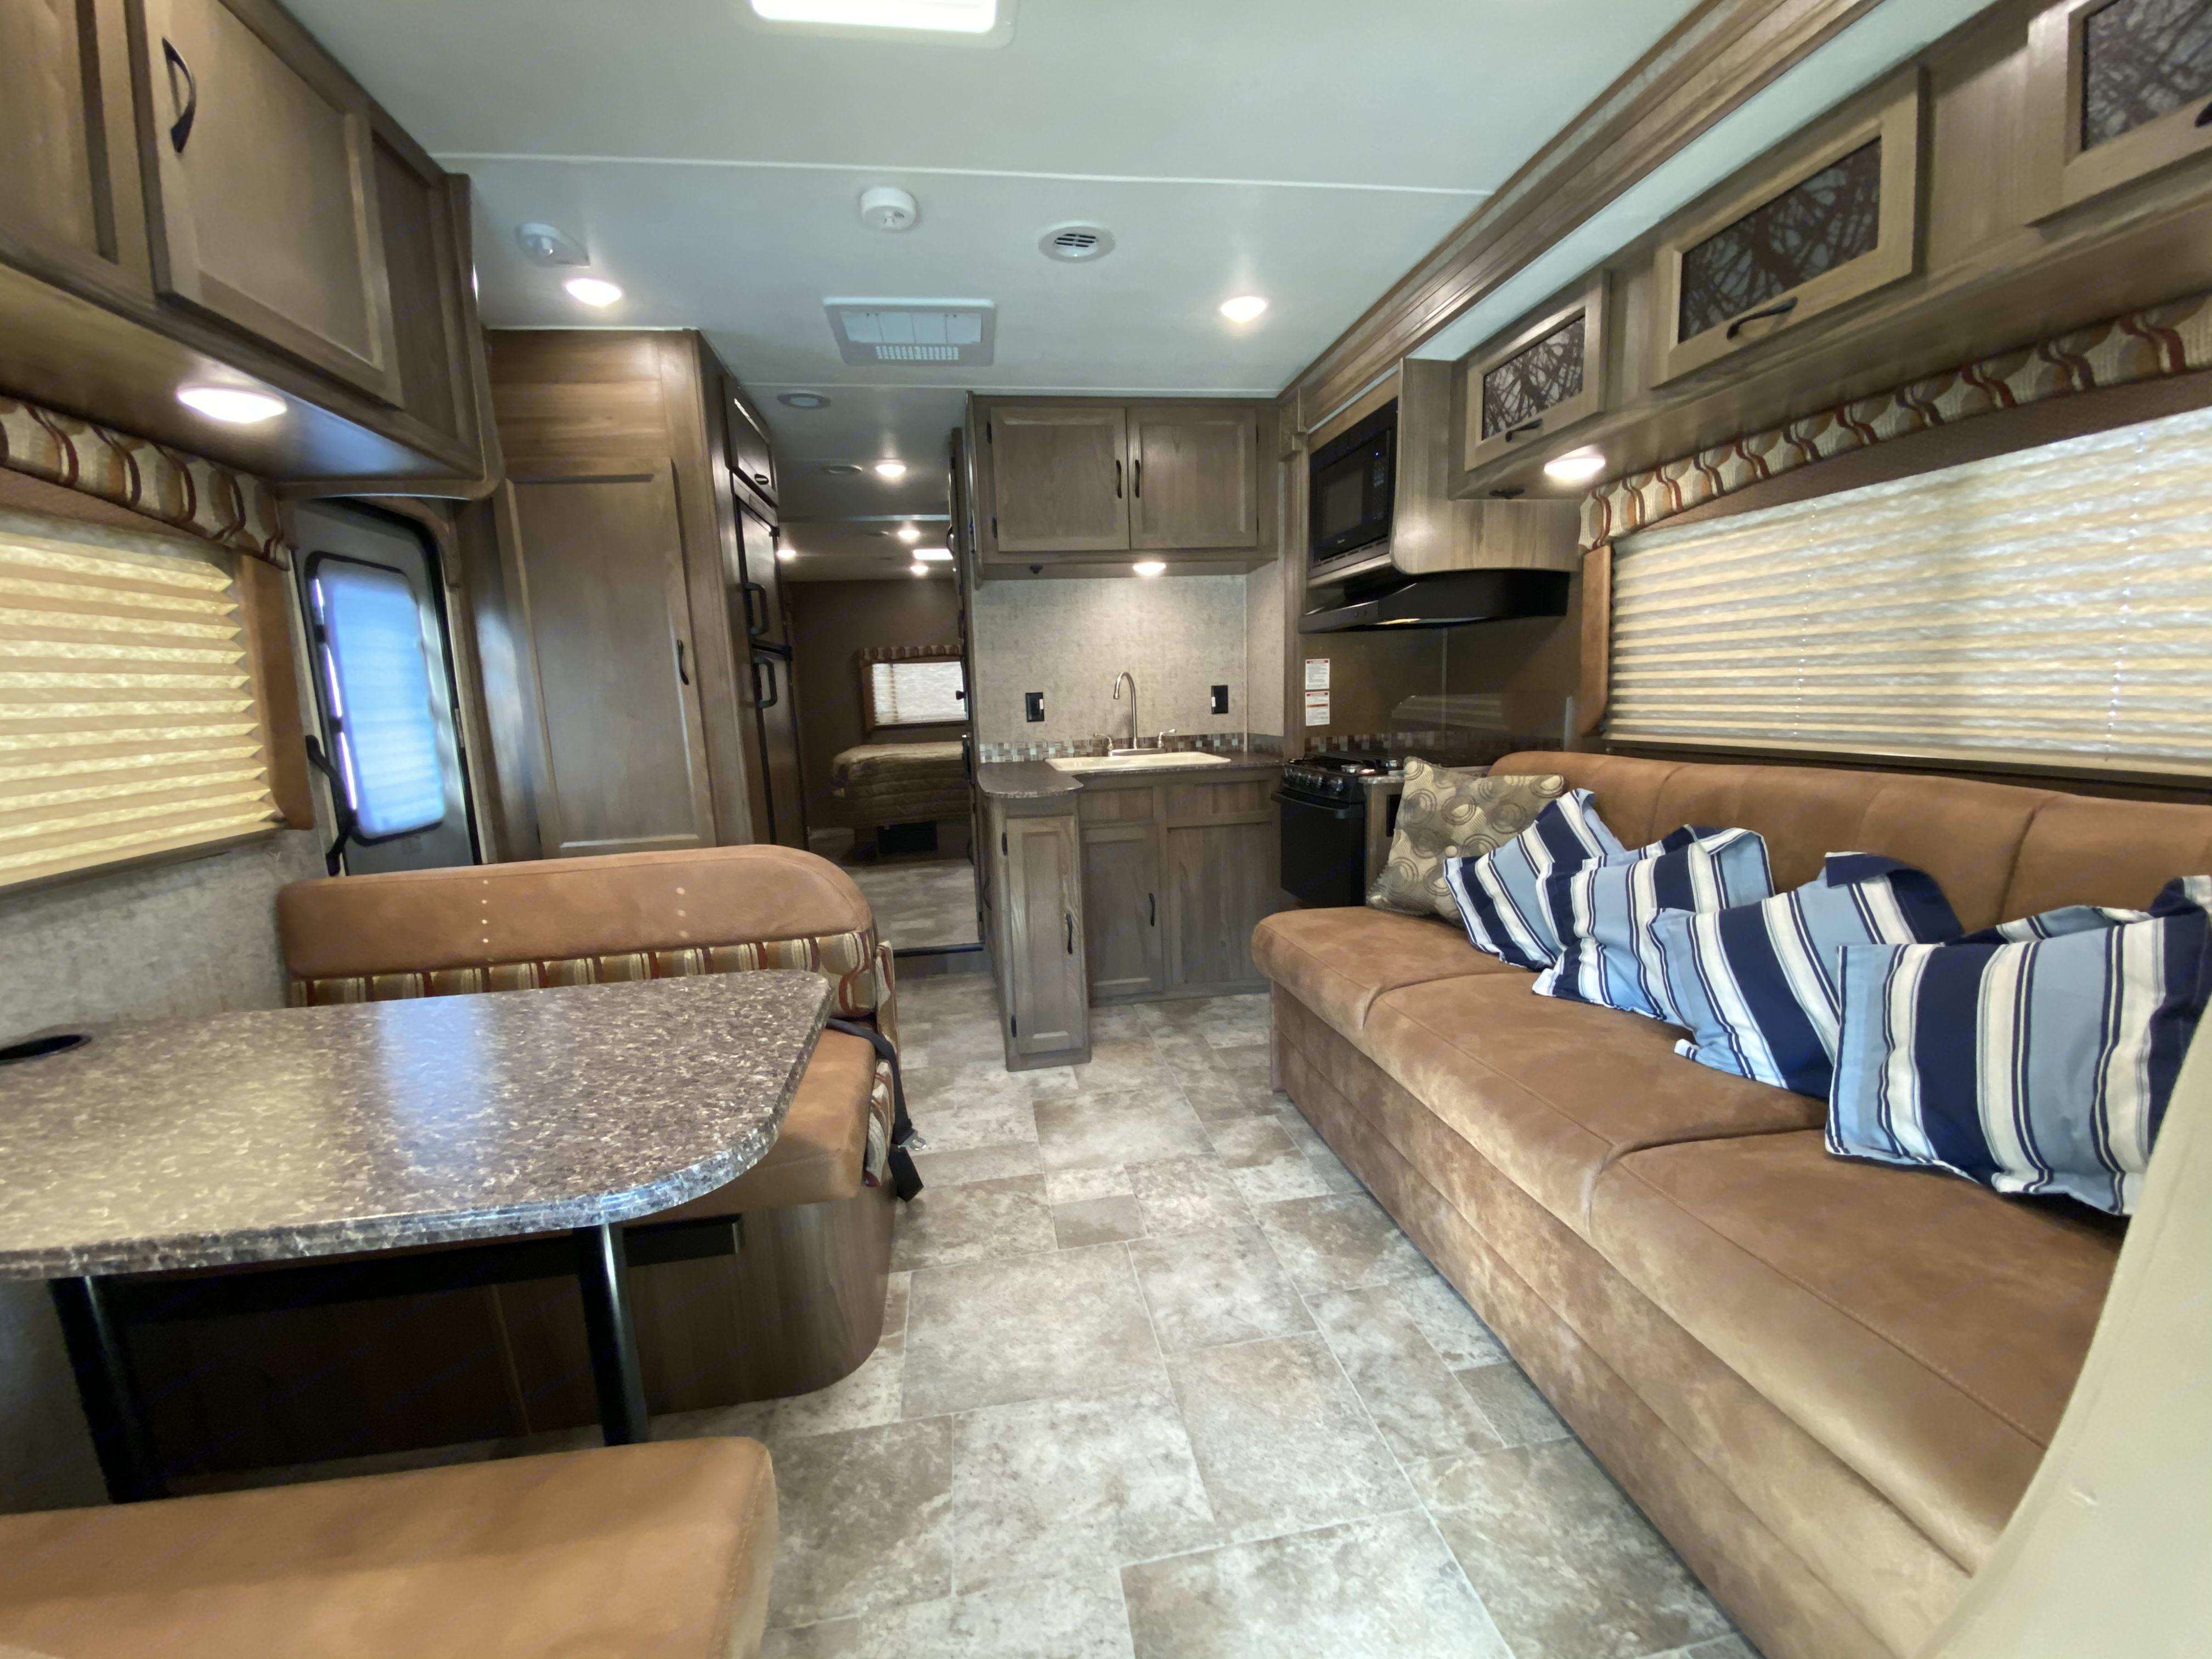 Overview from main cabin. Coachmen Freelander 2018